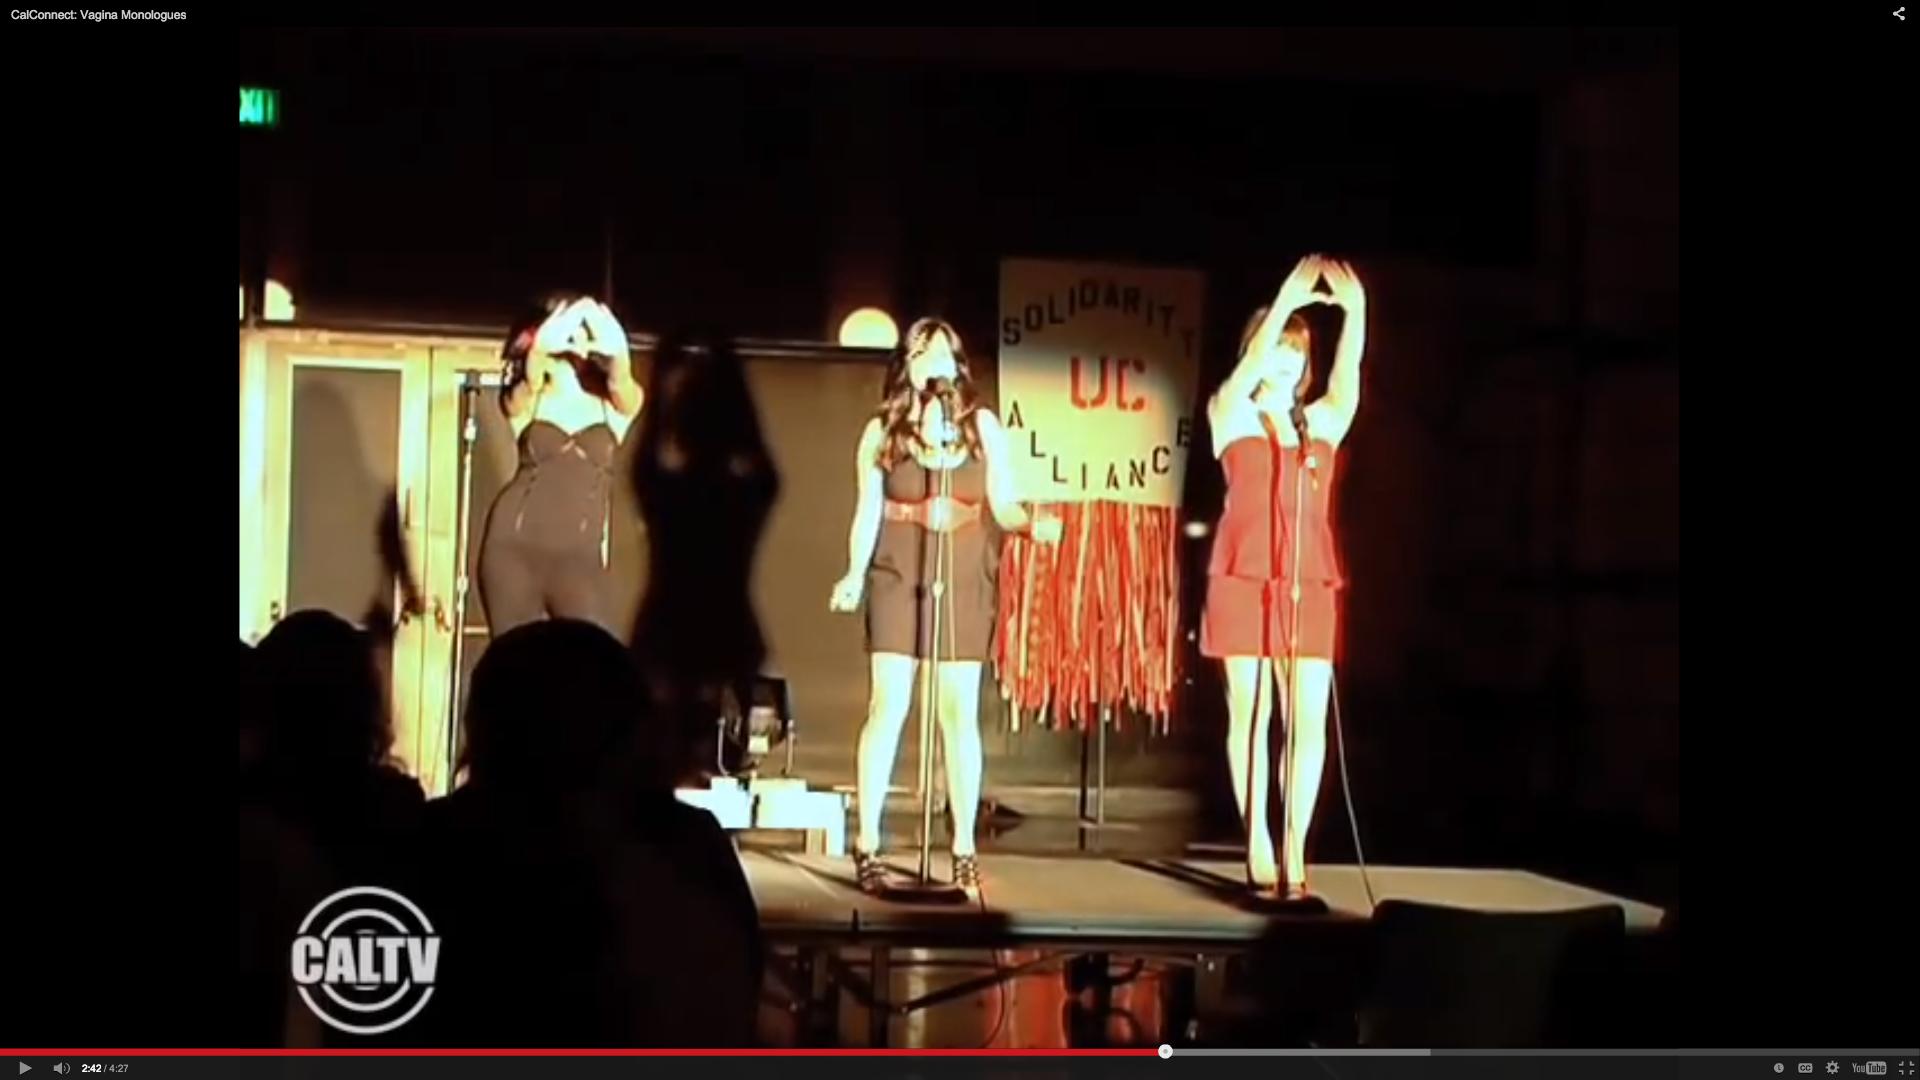 The Vagina Monologues 2012 Video Screenshot